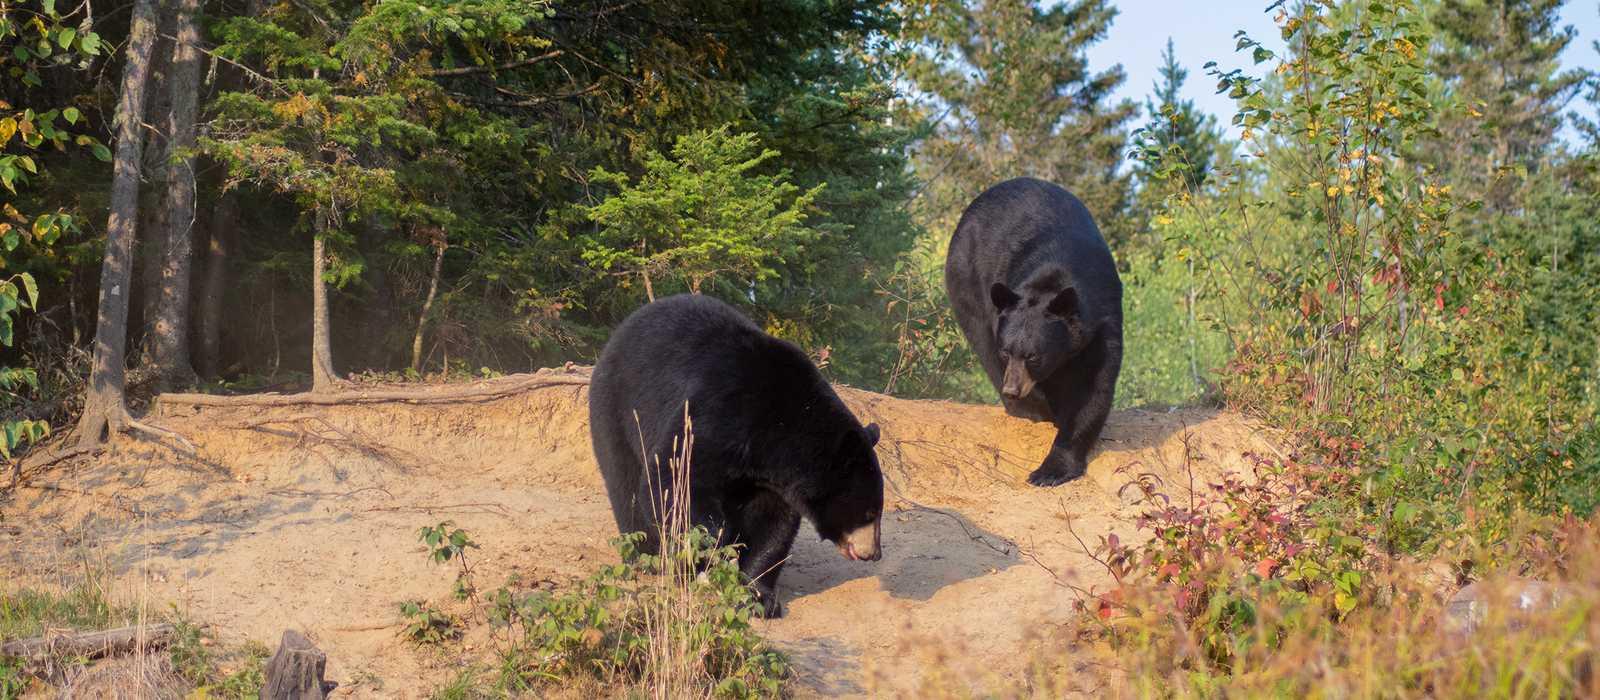 Schwarzbären-Beobachtung ab Sacré-Coeur in Québec mit dem Anbieter Ferme 5 Étoiles